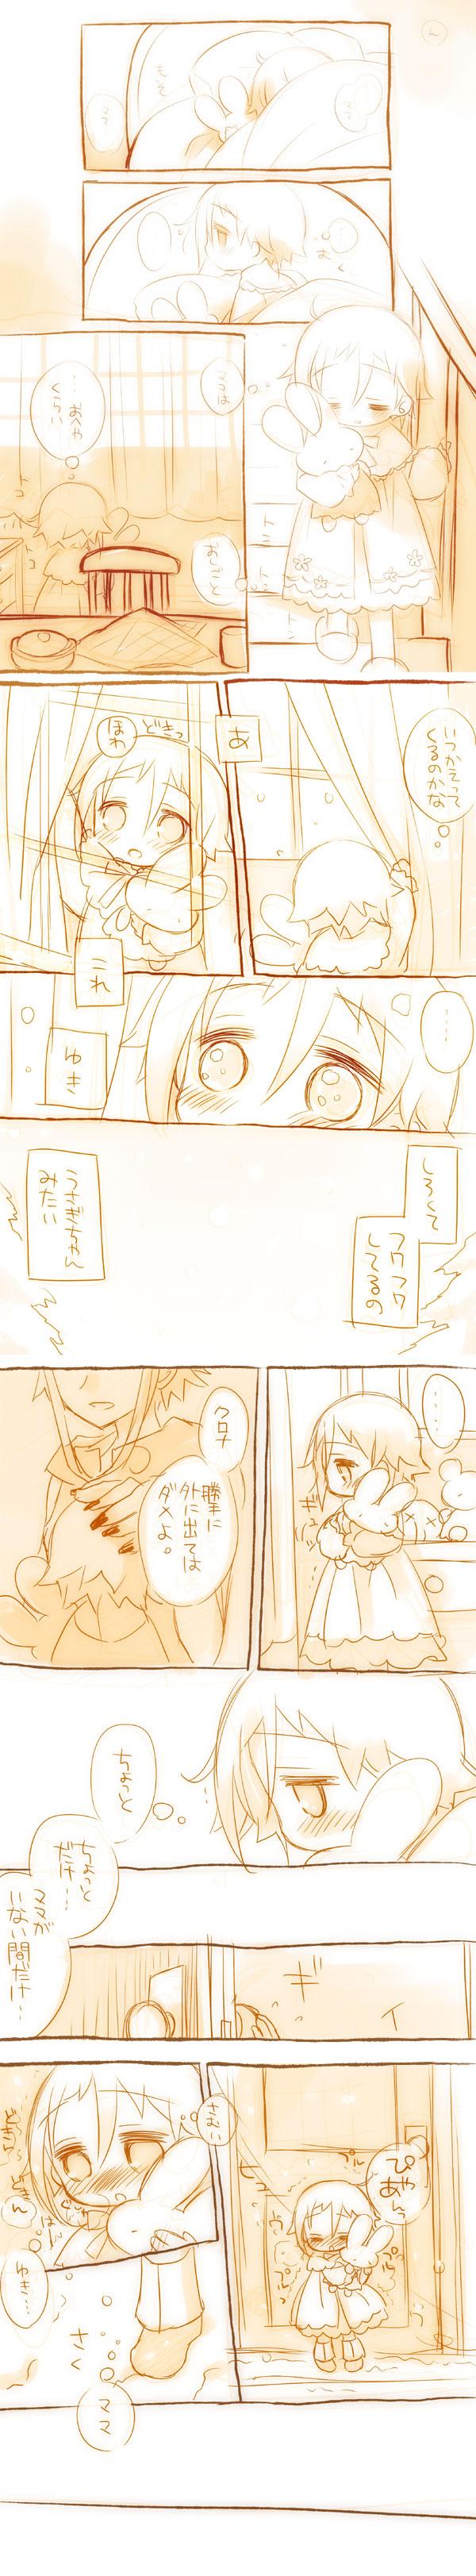 Tags: Anime, Sakurazawa Izumi, SQUARE ENIX, SOUL EATER, Crona, Medusa Gorgon, Translation Request